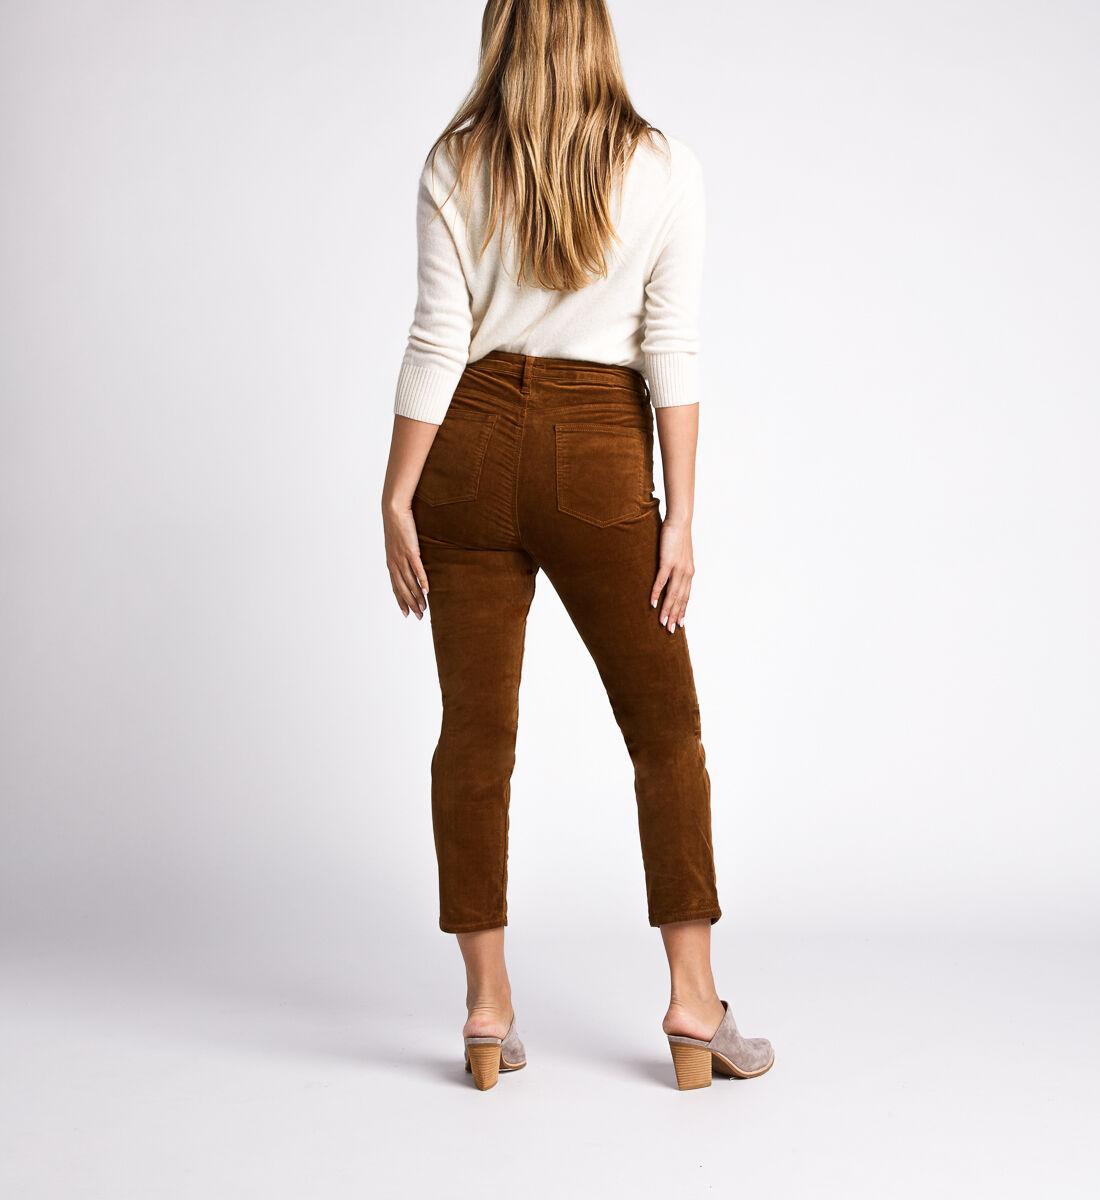 High Note High Rise Slim Leg Pants,Caramel Back